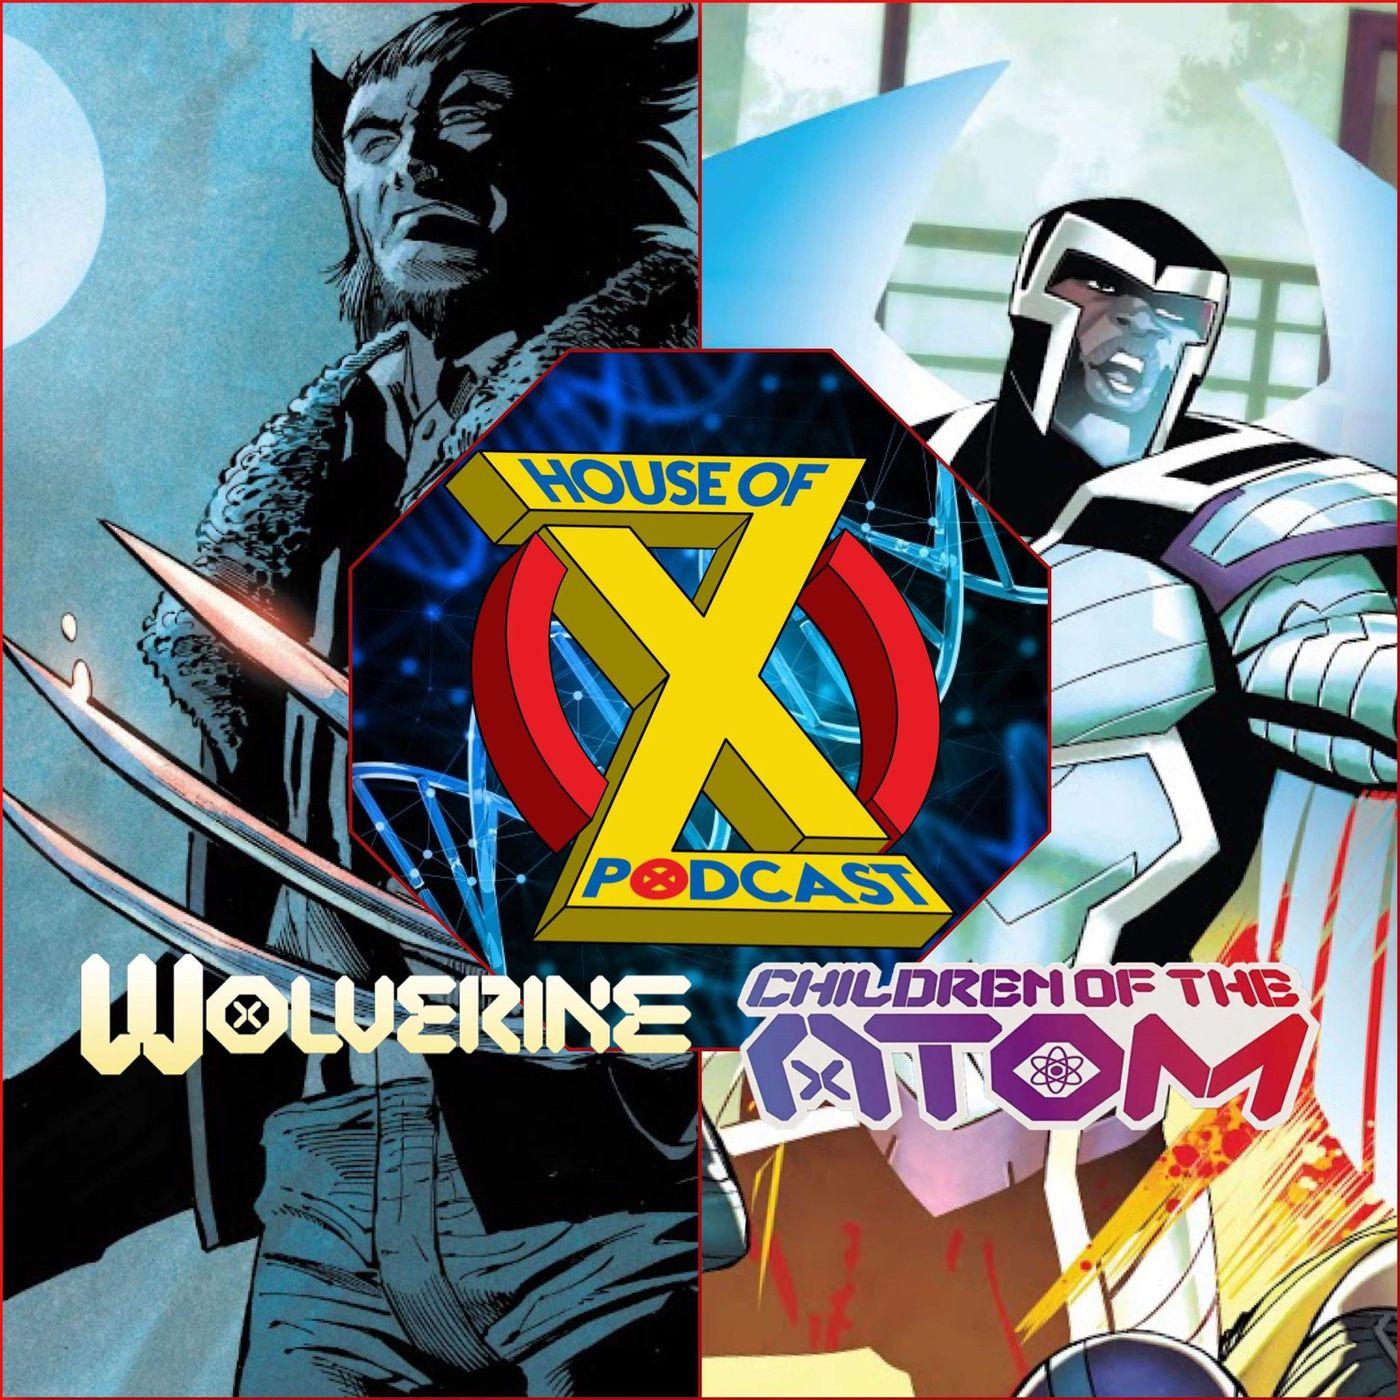 Episode 62 - Vampires and Young X-Men